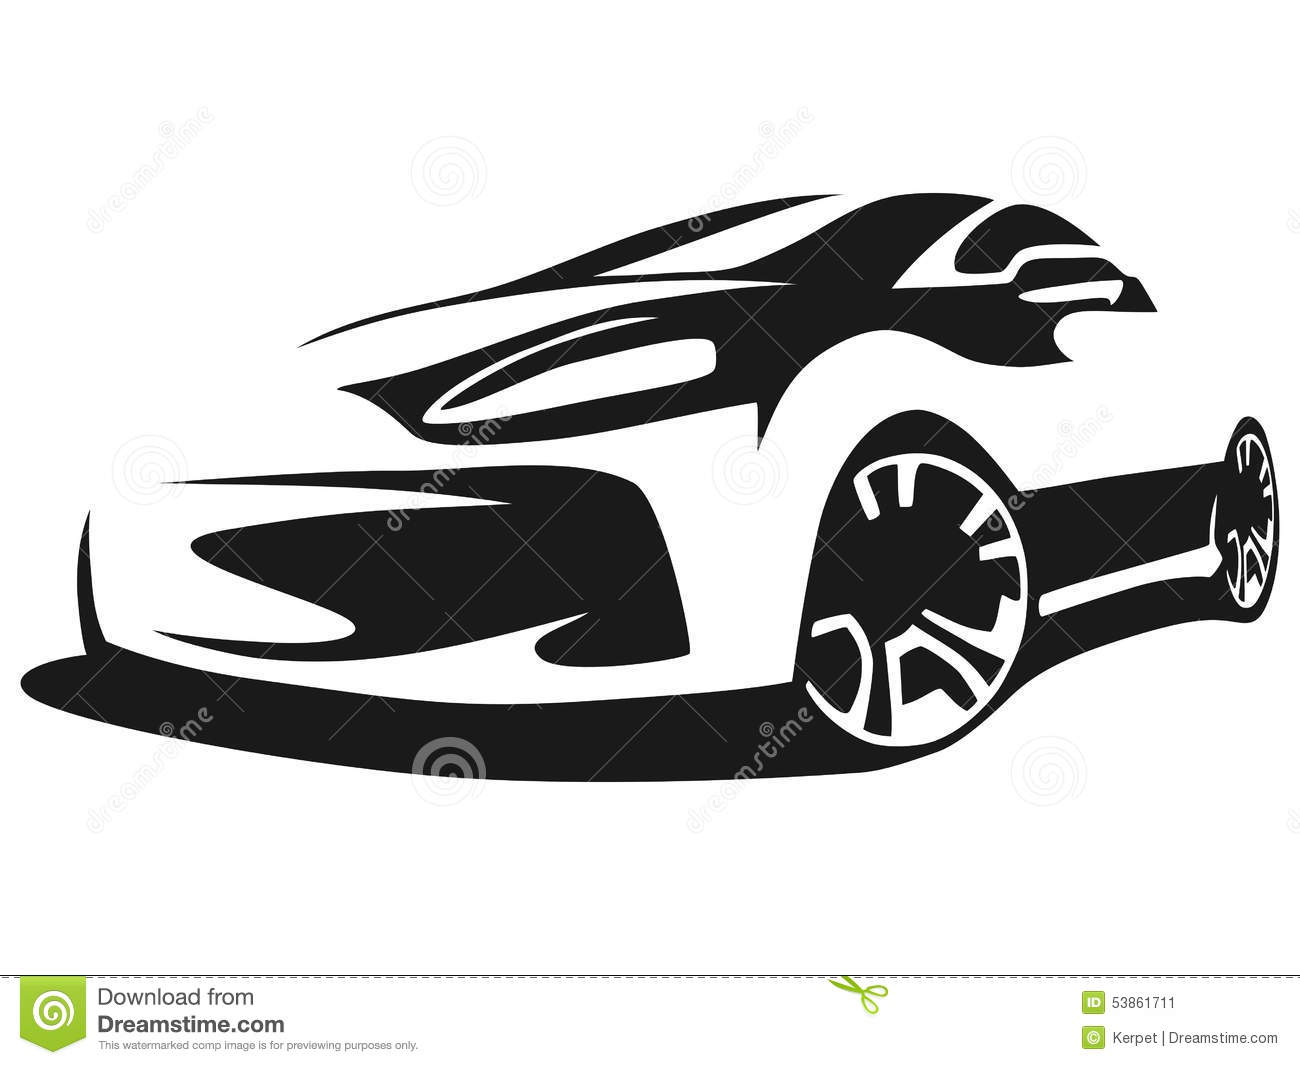 Silhouette tuning car stock vector. Illustration of illustration - 53861711